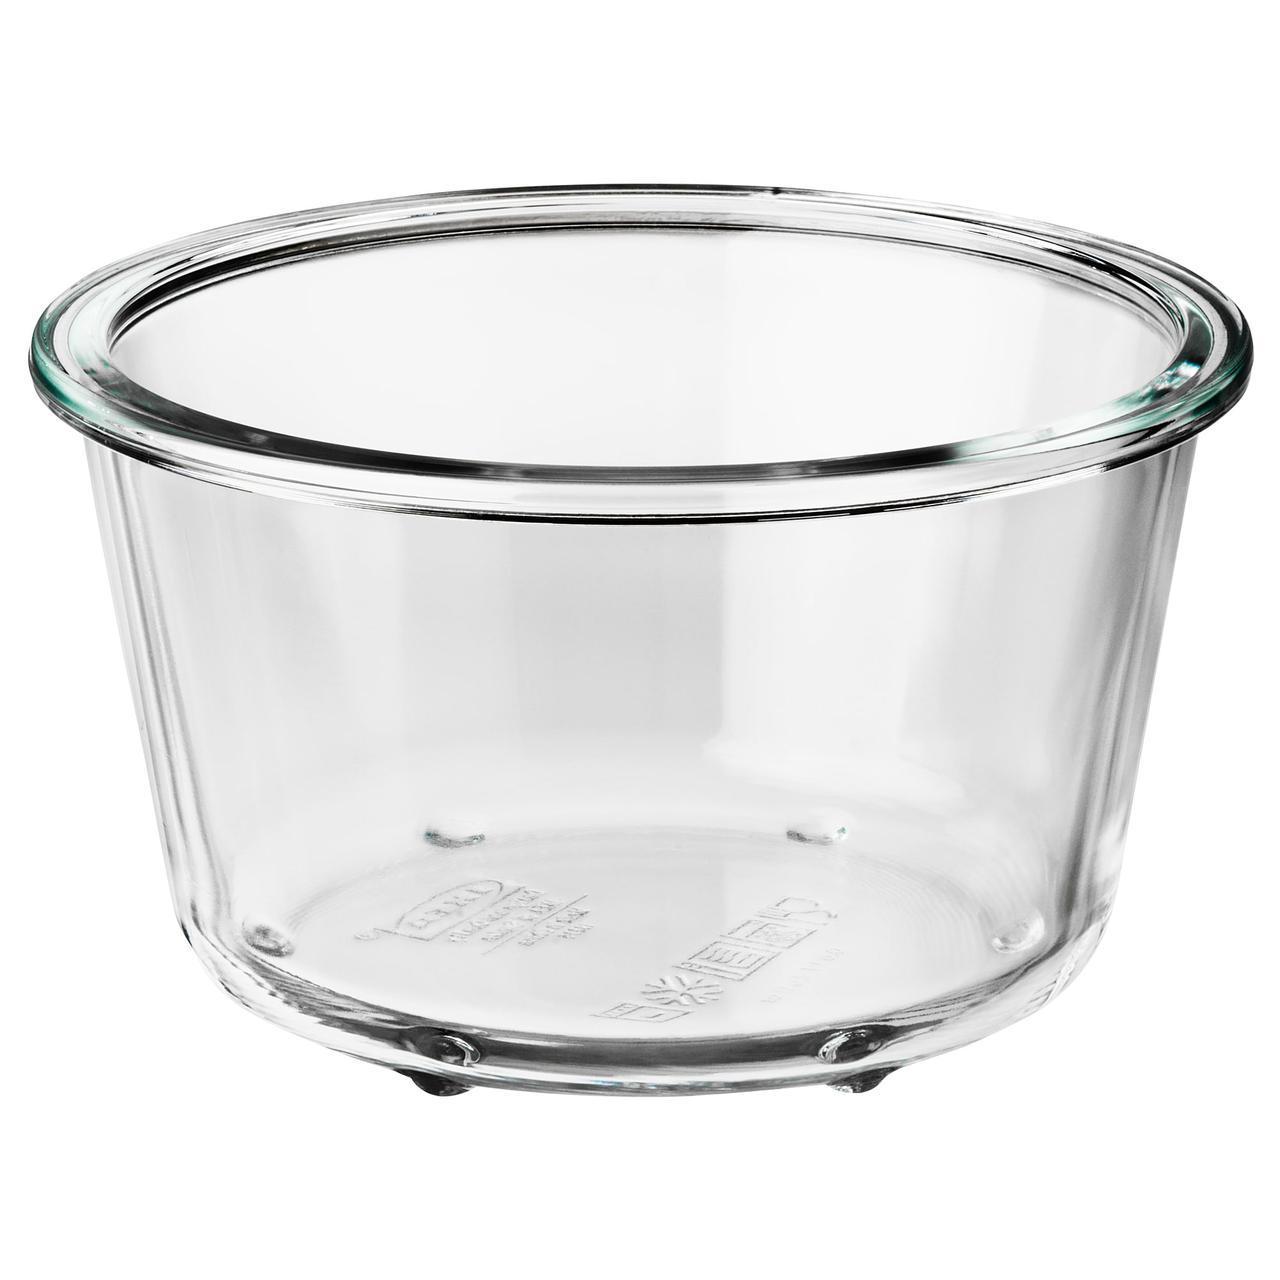 ✅ IKEA IKEA 365+ (303.591.96) Контейнер для еды, круглый, стакан